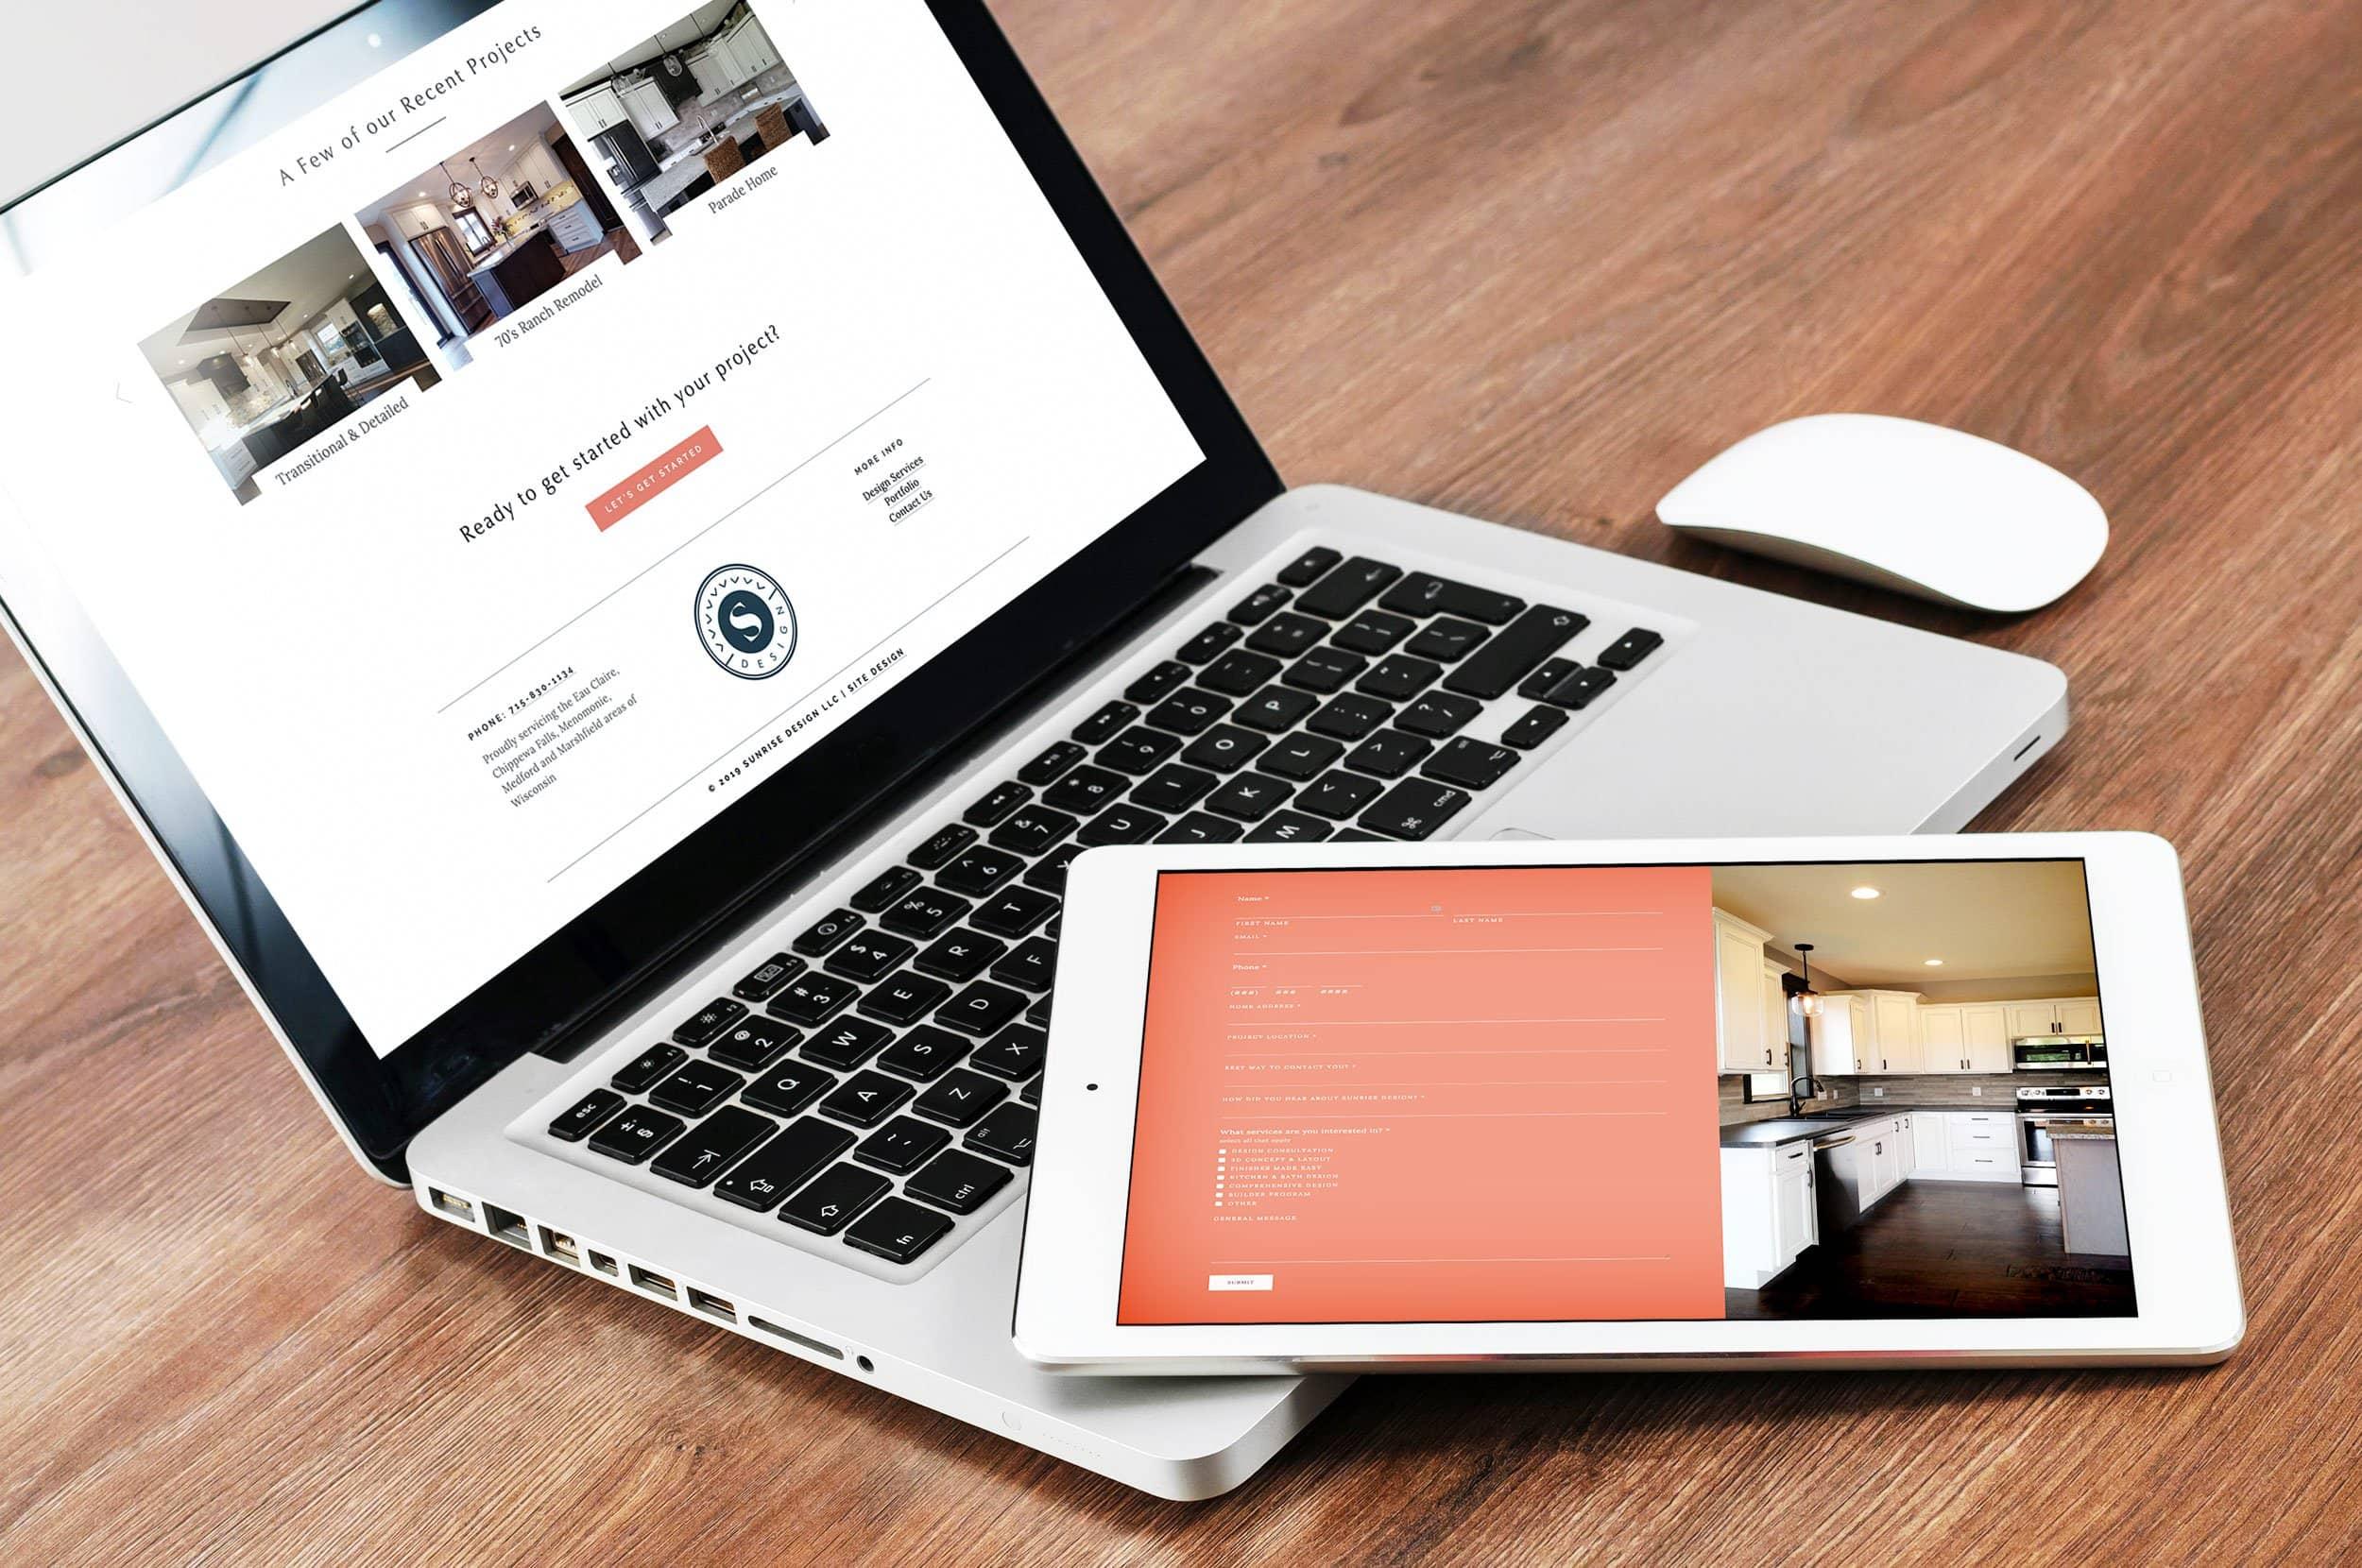 interior designer for builders sunrise design llc website custom built by site maker studio using squarespace